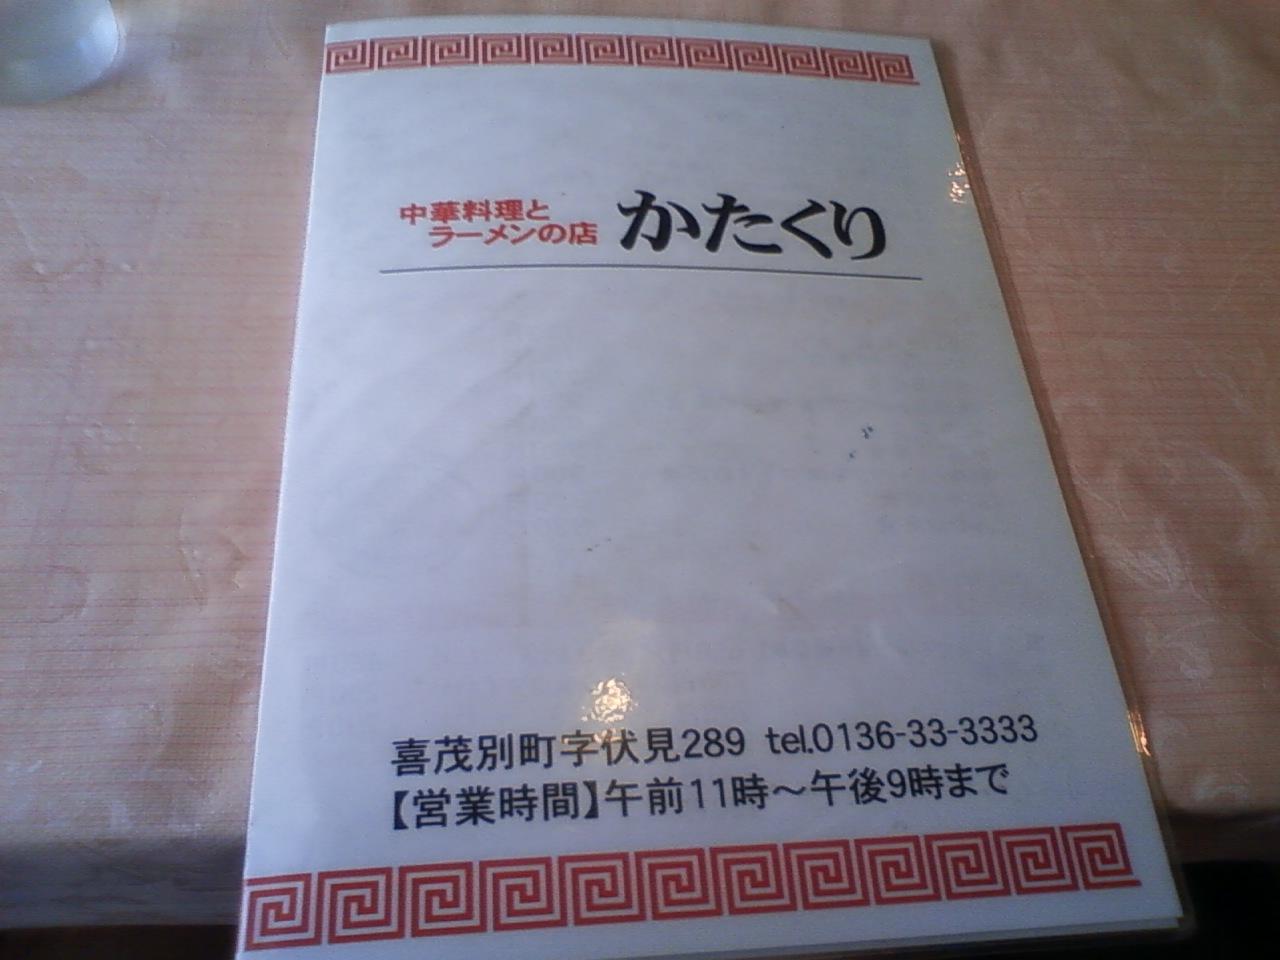 Ts3k0109